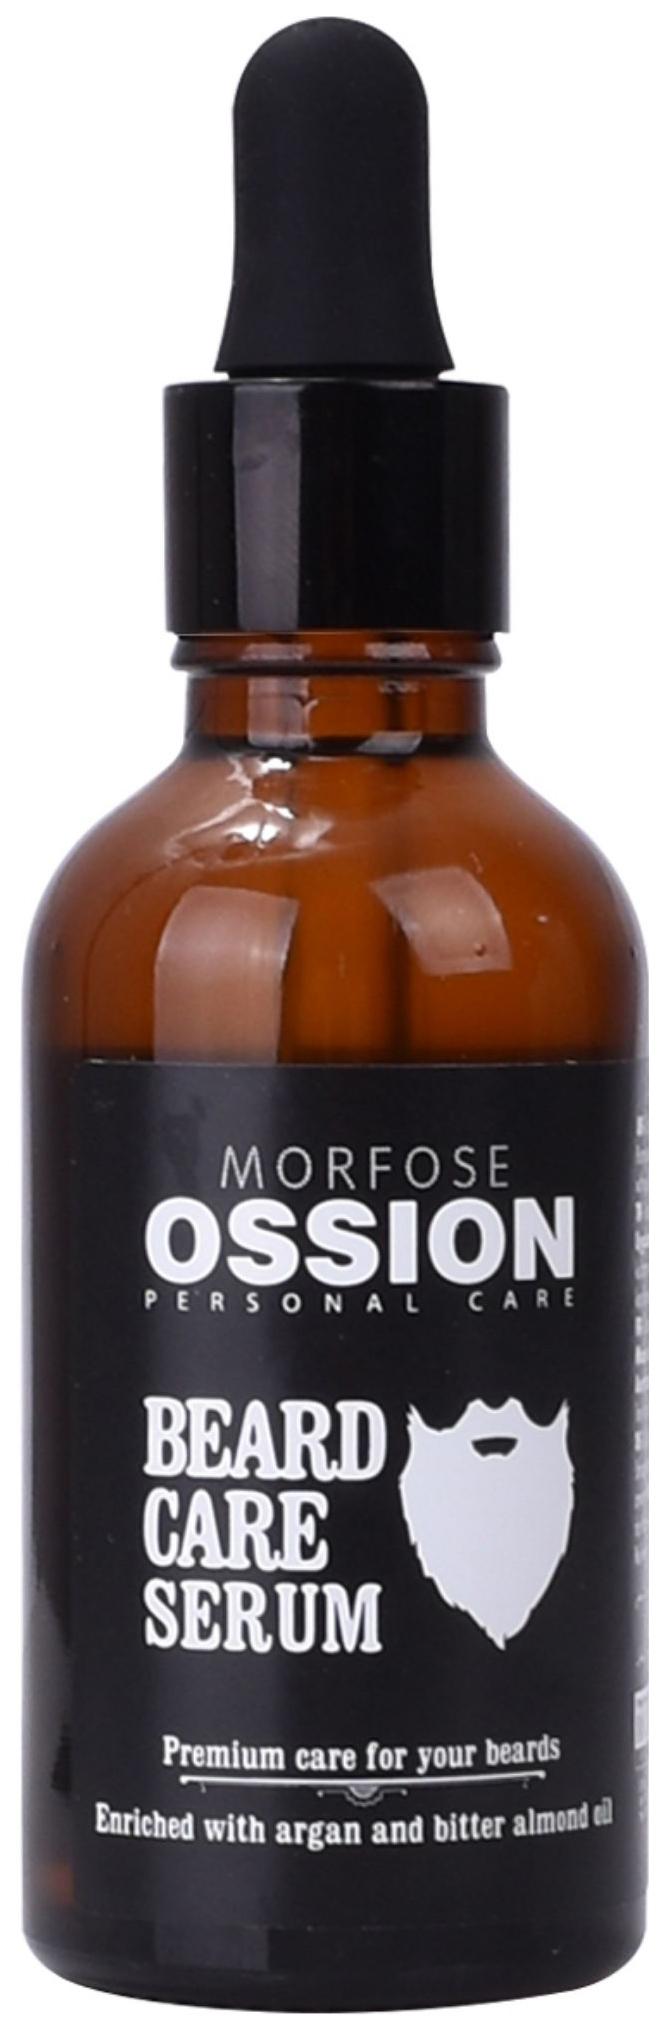 Сыворотка для бороды MORFOSE OSSION Beard Care